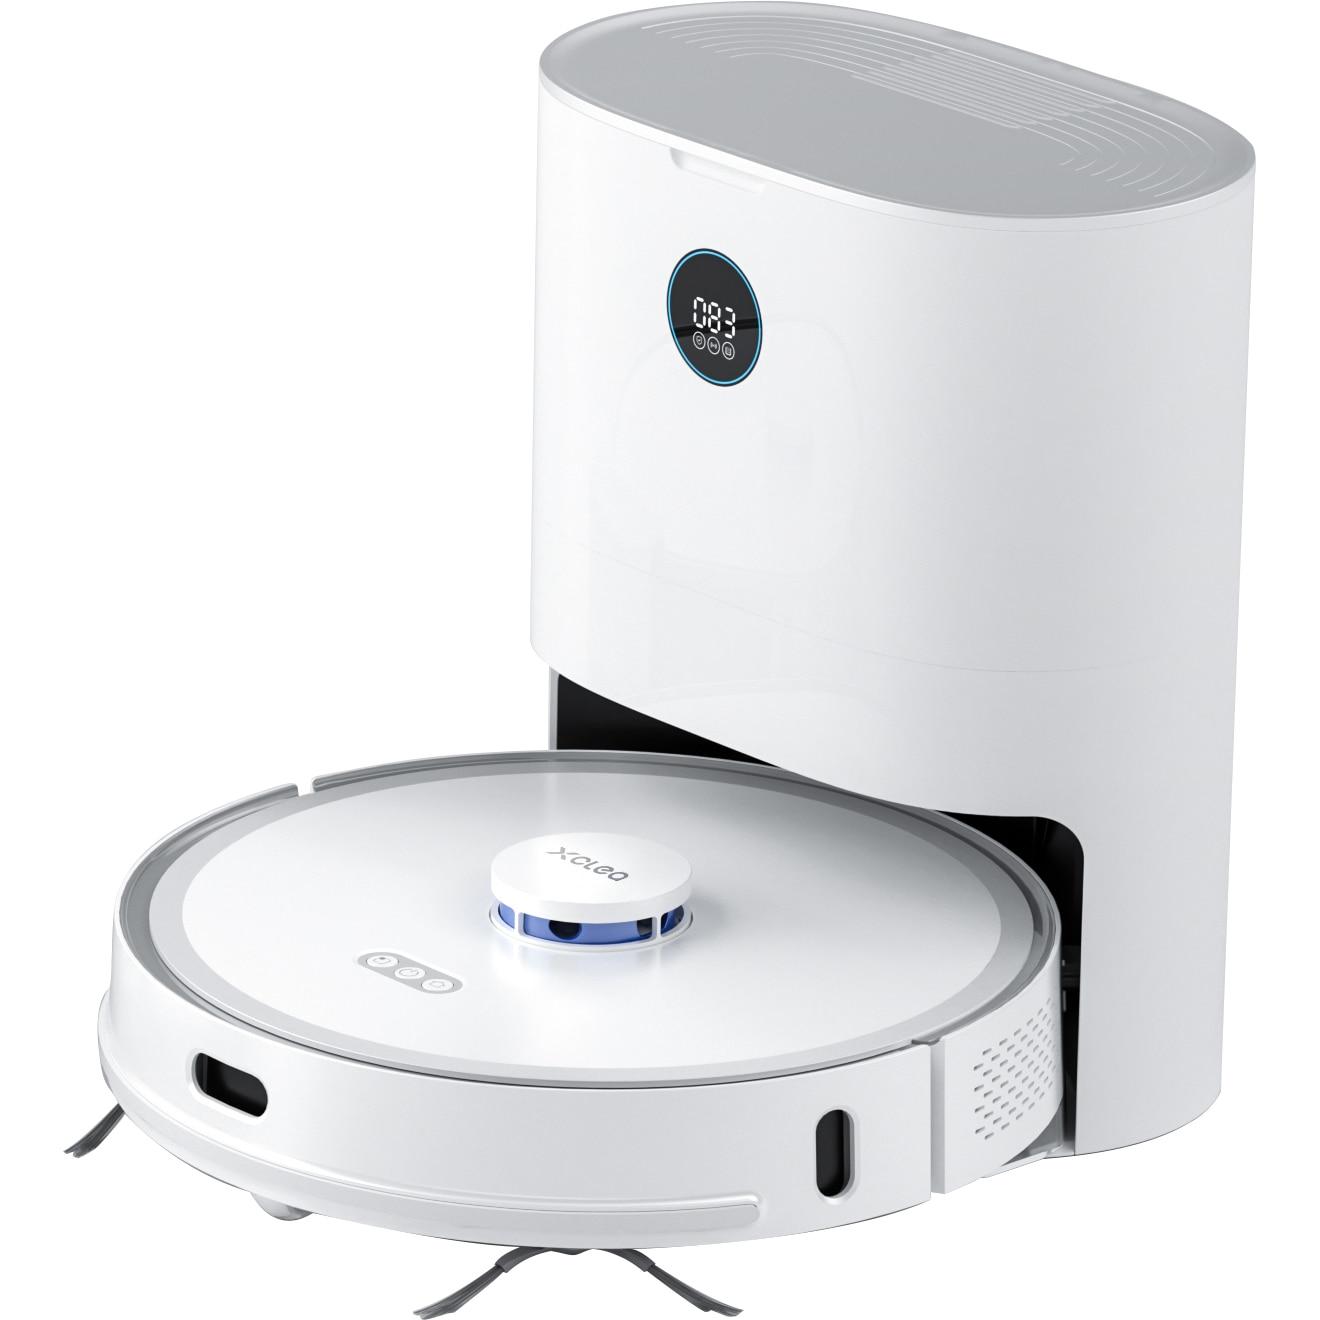 Fotografie Robot de aspirare Xclea H30 Plus, Mop , 50W, 5200 mAh, Putere de absorbtie 2700Pa, Colector praf 3l, Filtru Hepa, Alb